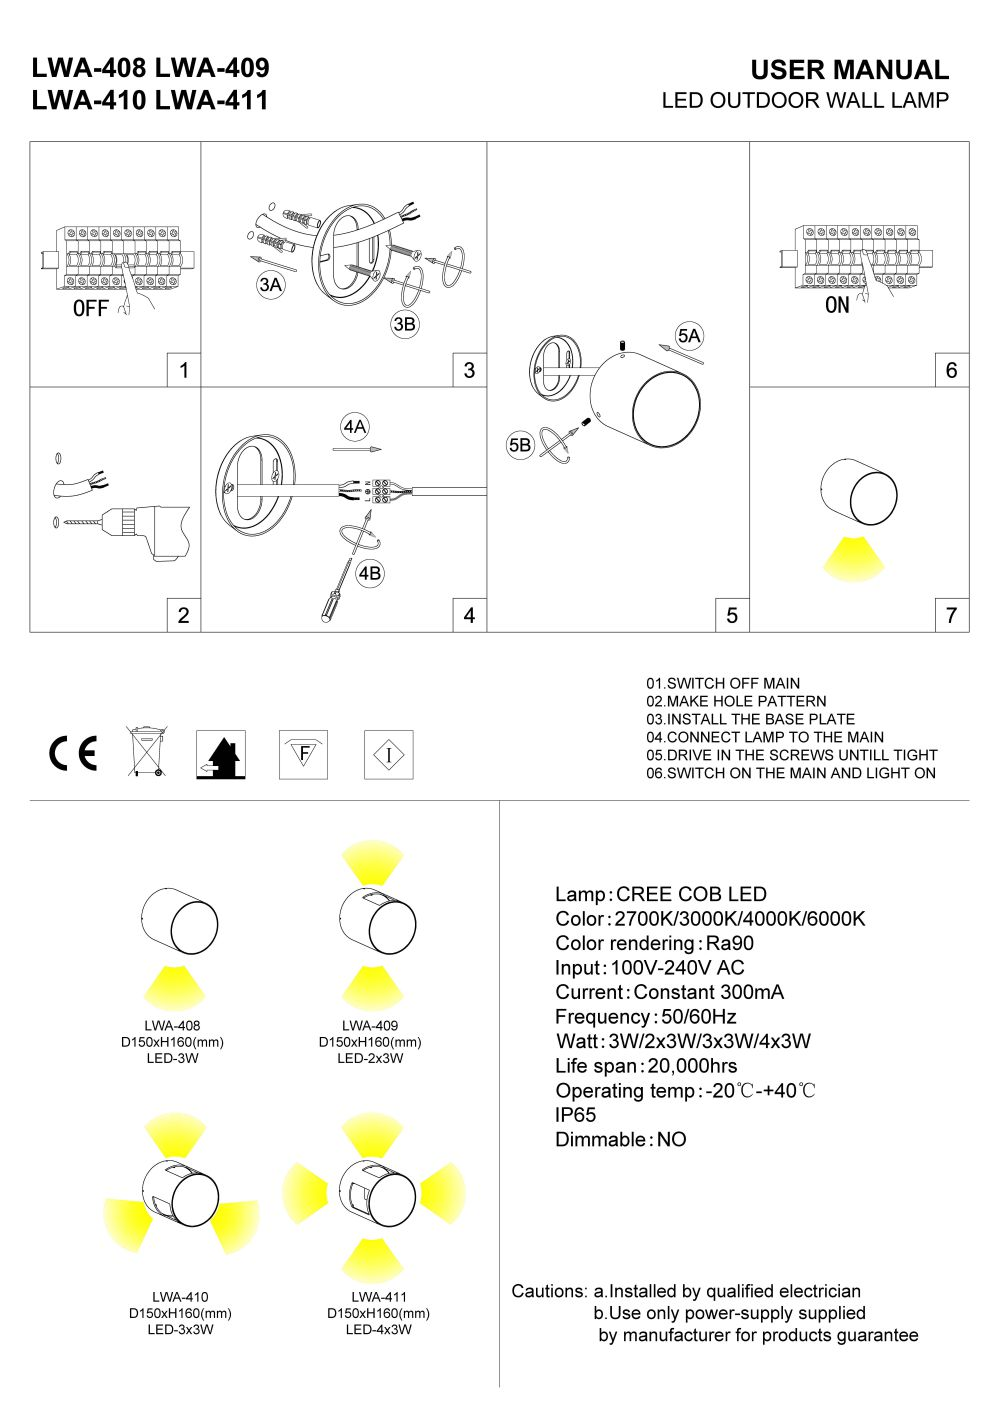 LWA-408 LWA-409 LWA-410 LWA-411 outdoor wall light installation guide